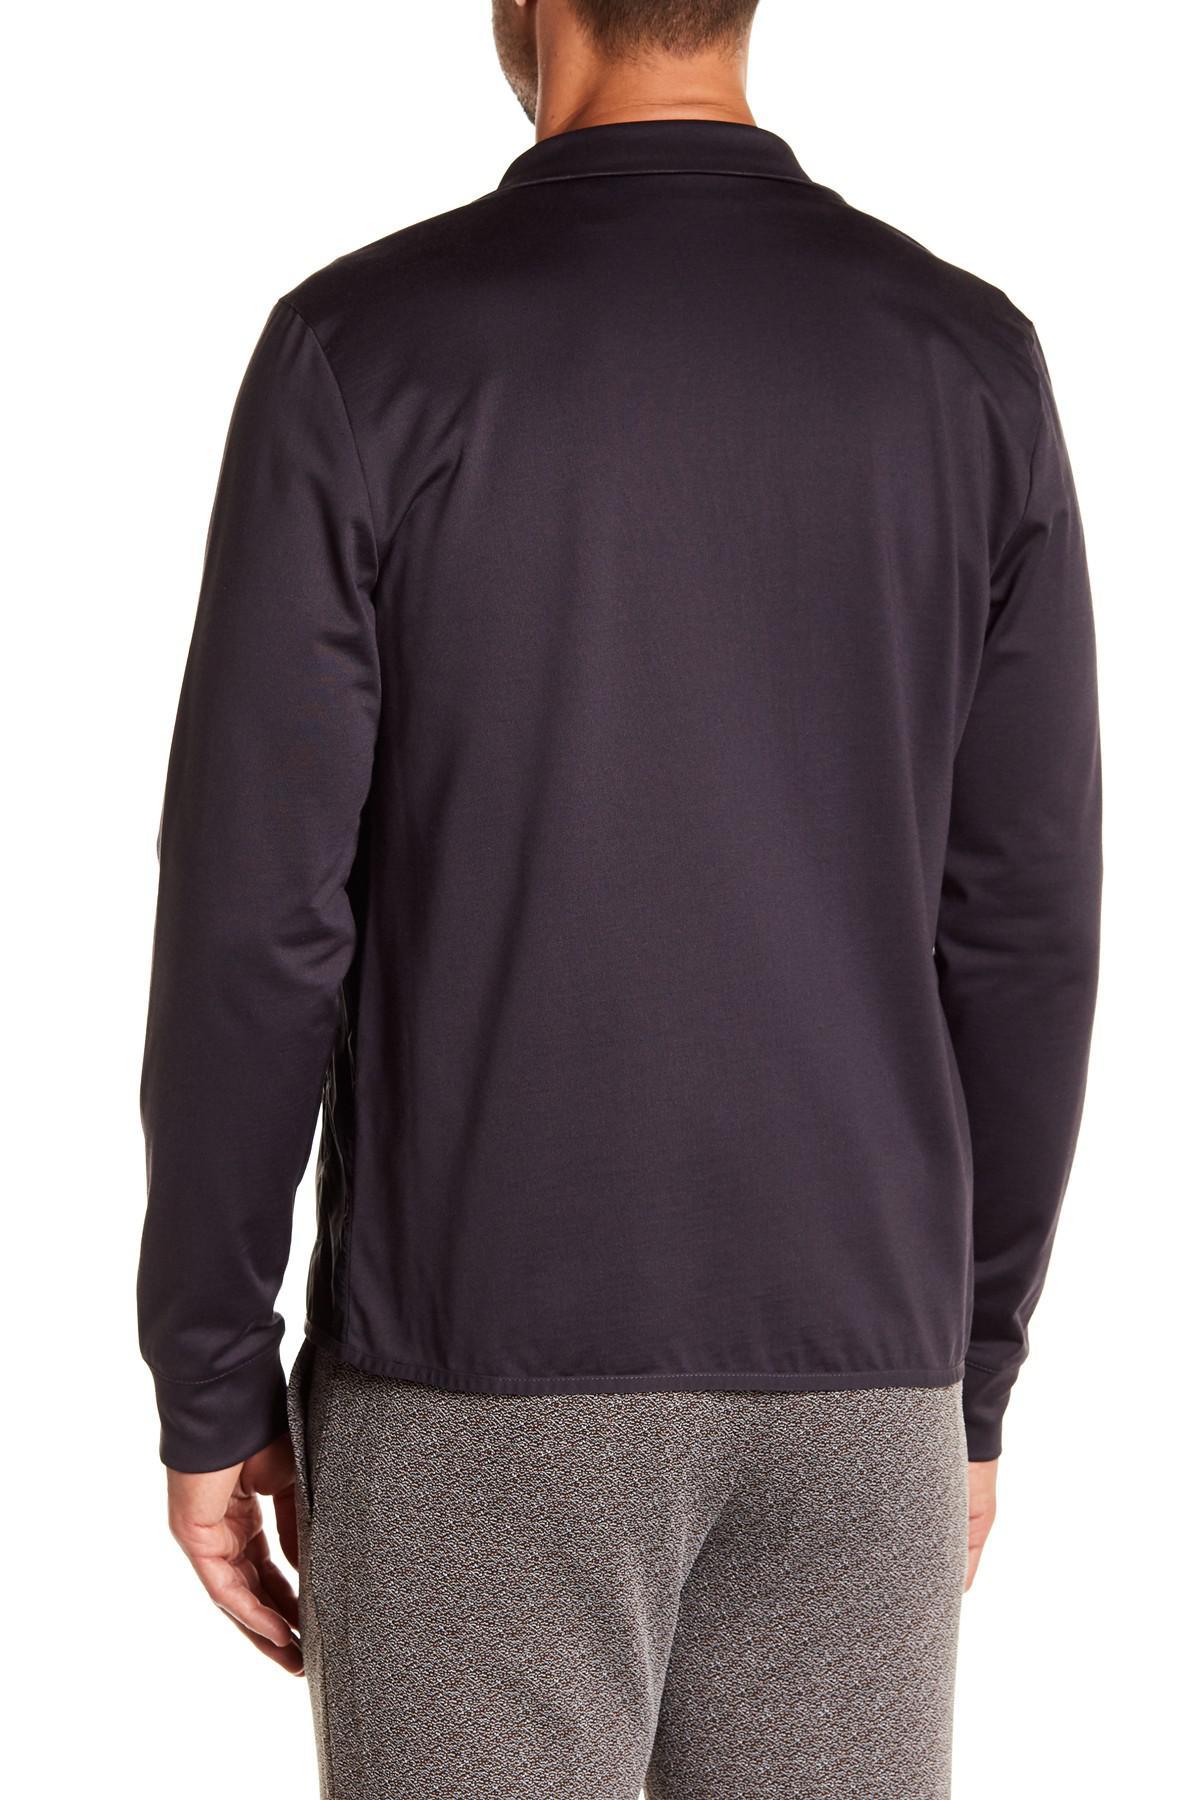 Lyst Perry Ellis Cotton Polyester Mock Neck Jacket For Men